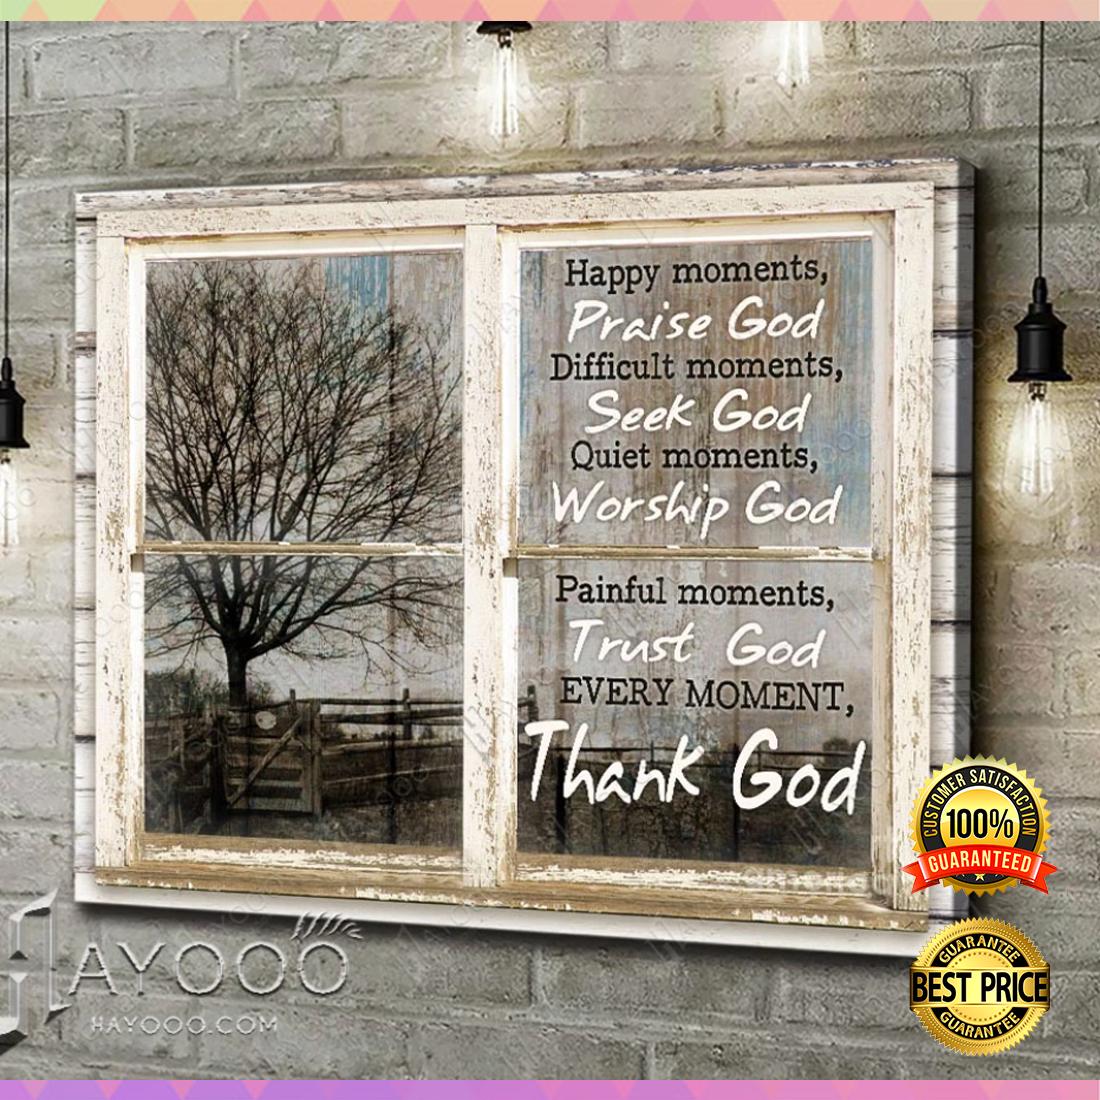 Happy moments praise god difficult moments seek god canvas 4